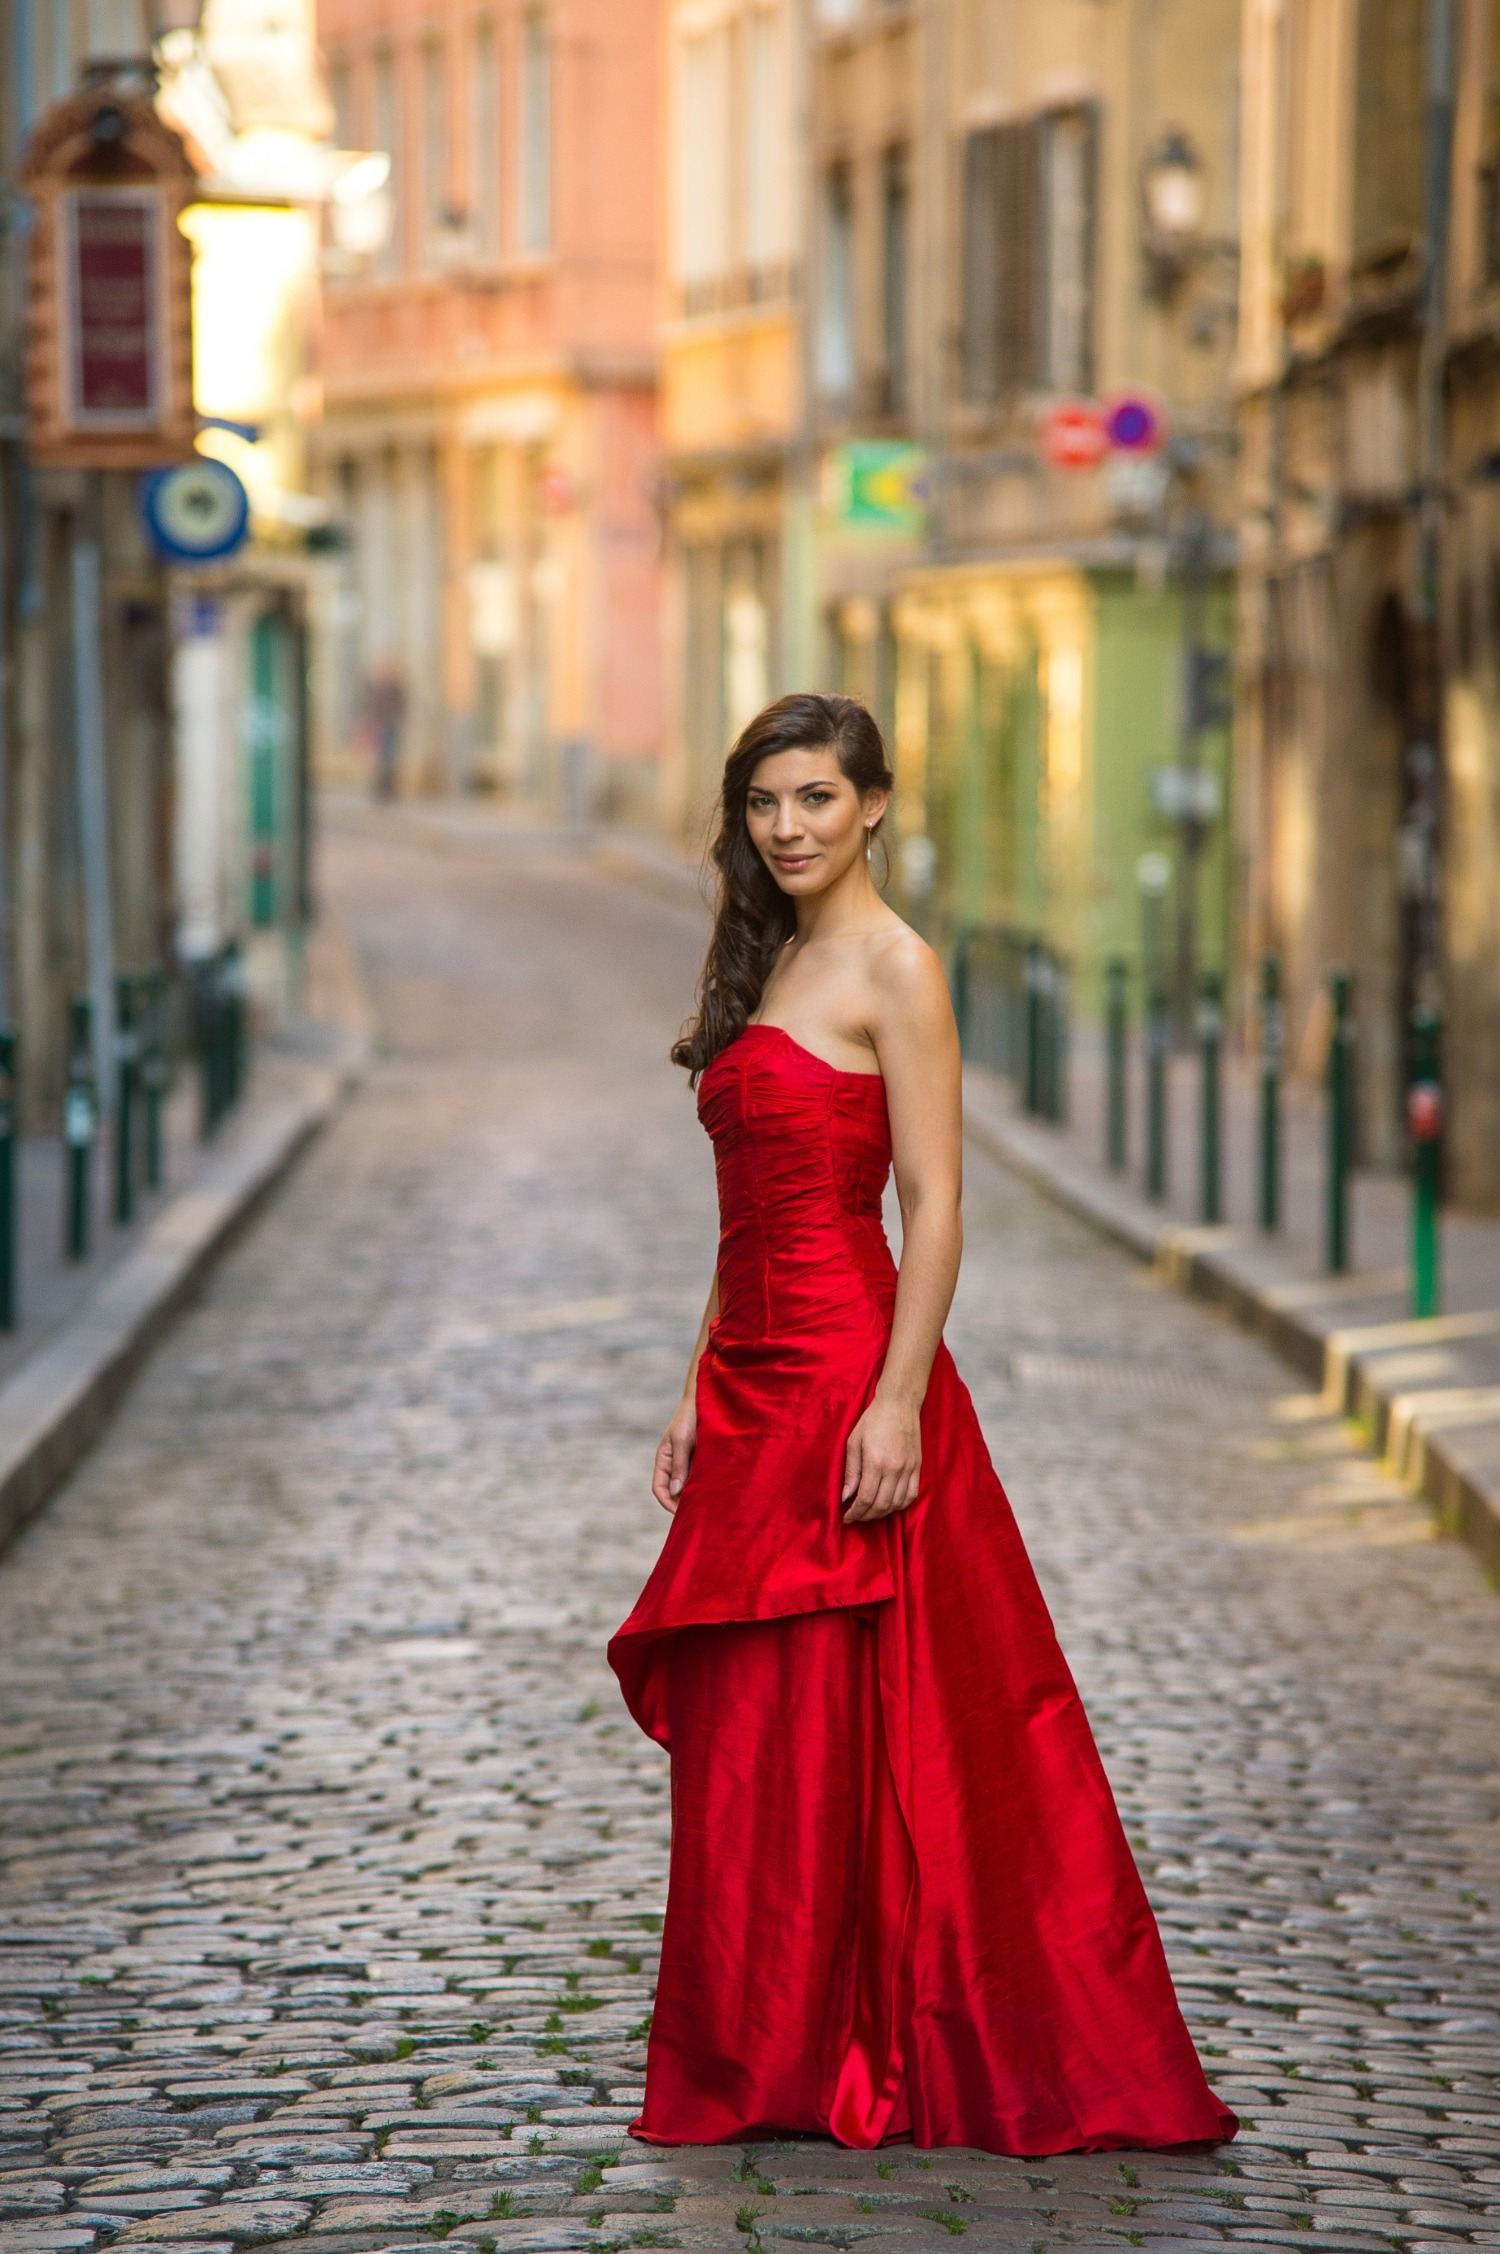 Héloïse Mas / Portrait © Yanis Ouraba